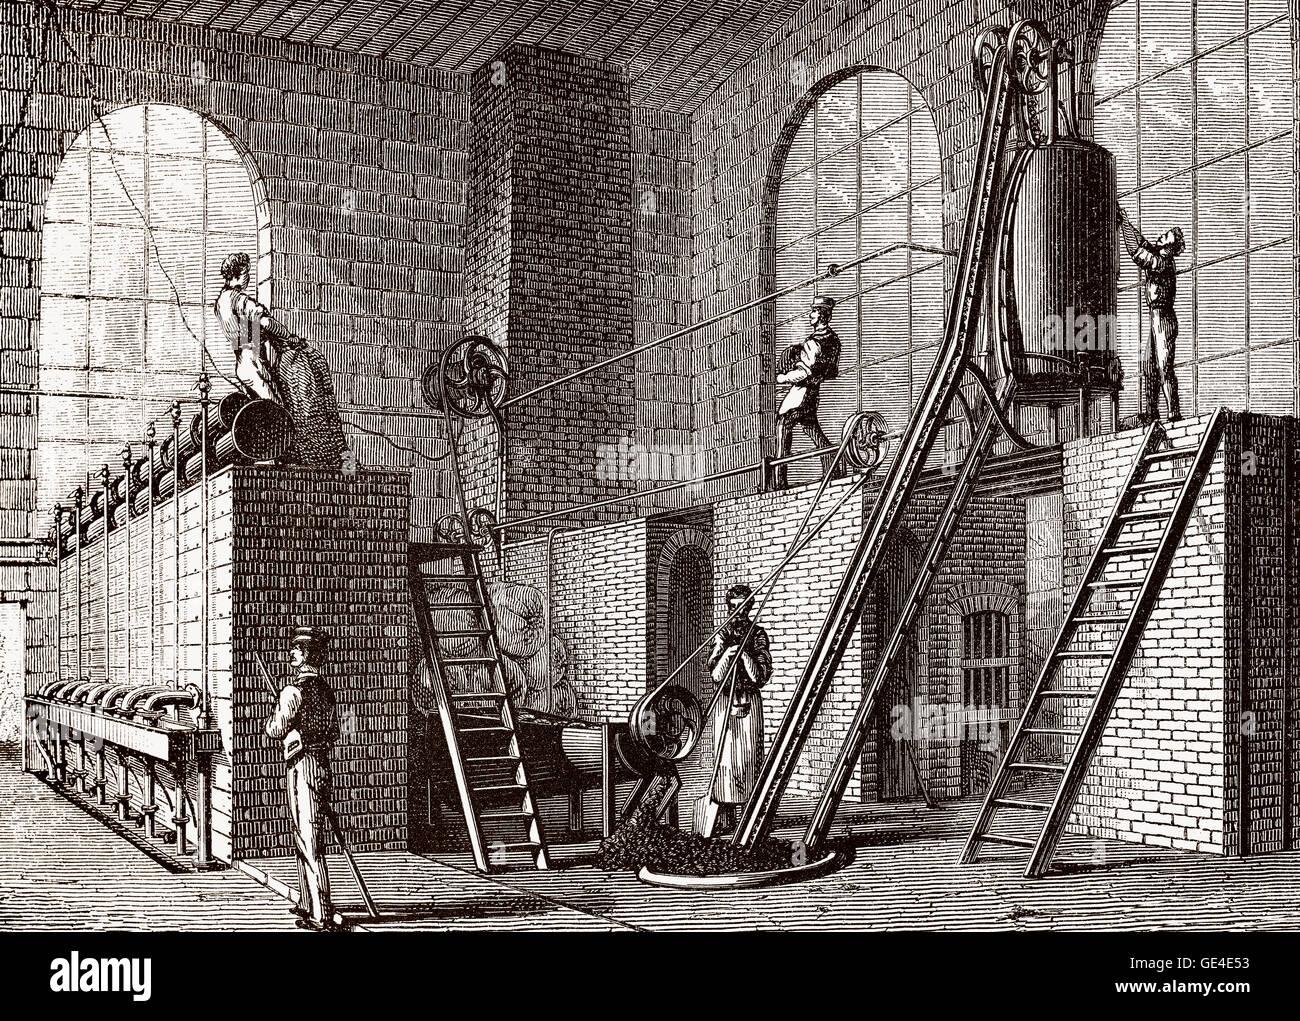 A Sugar beet refinery, 19th century - Stock Image